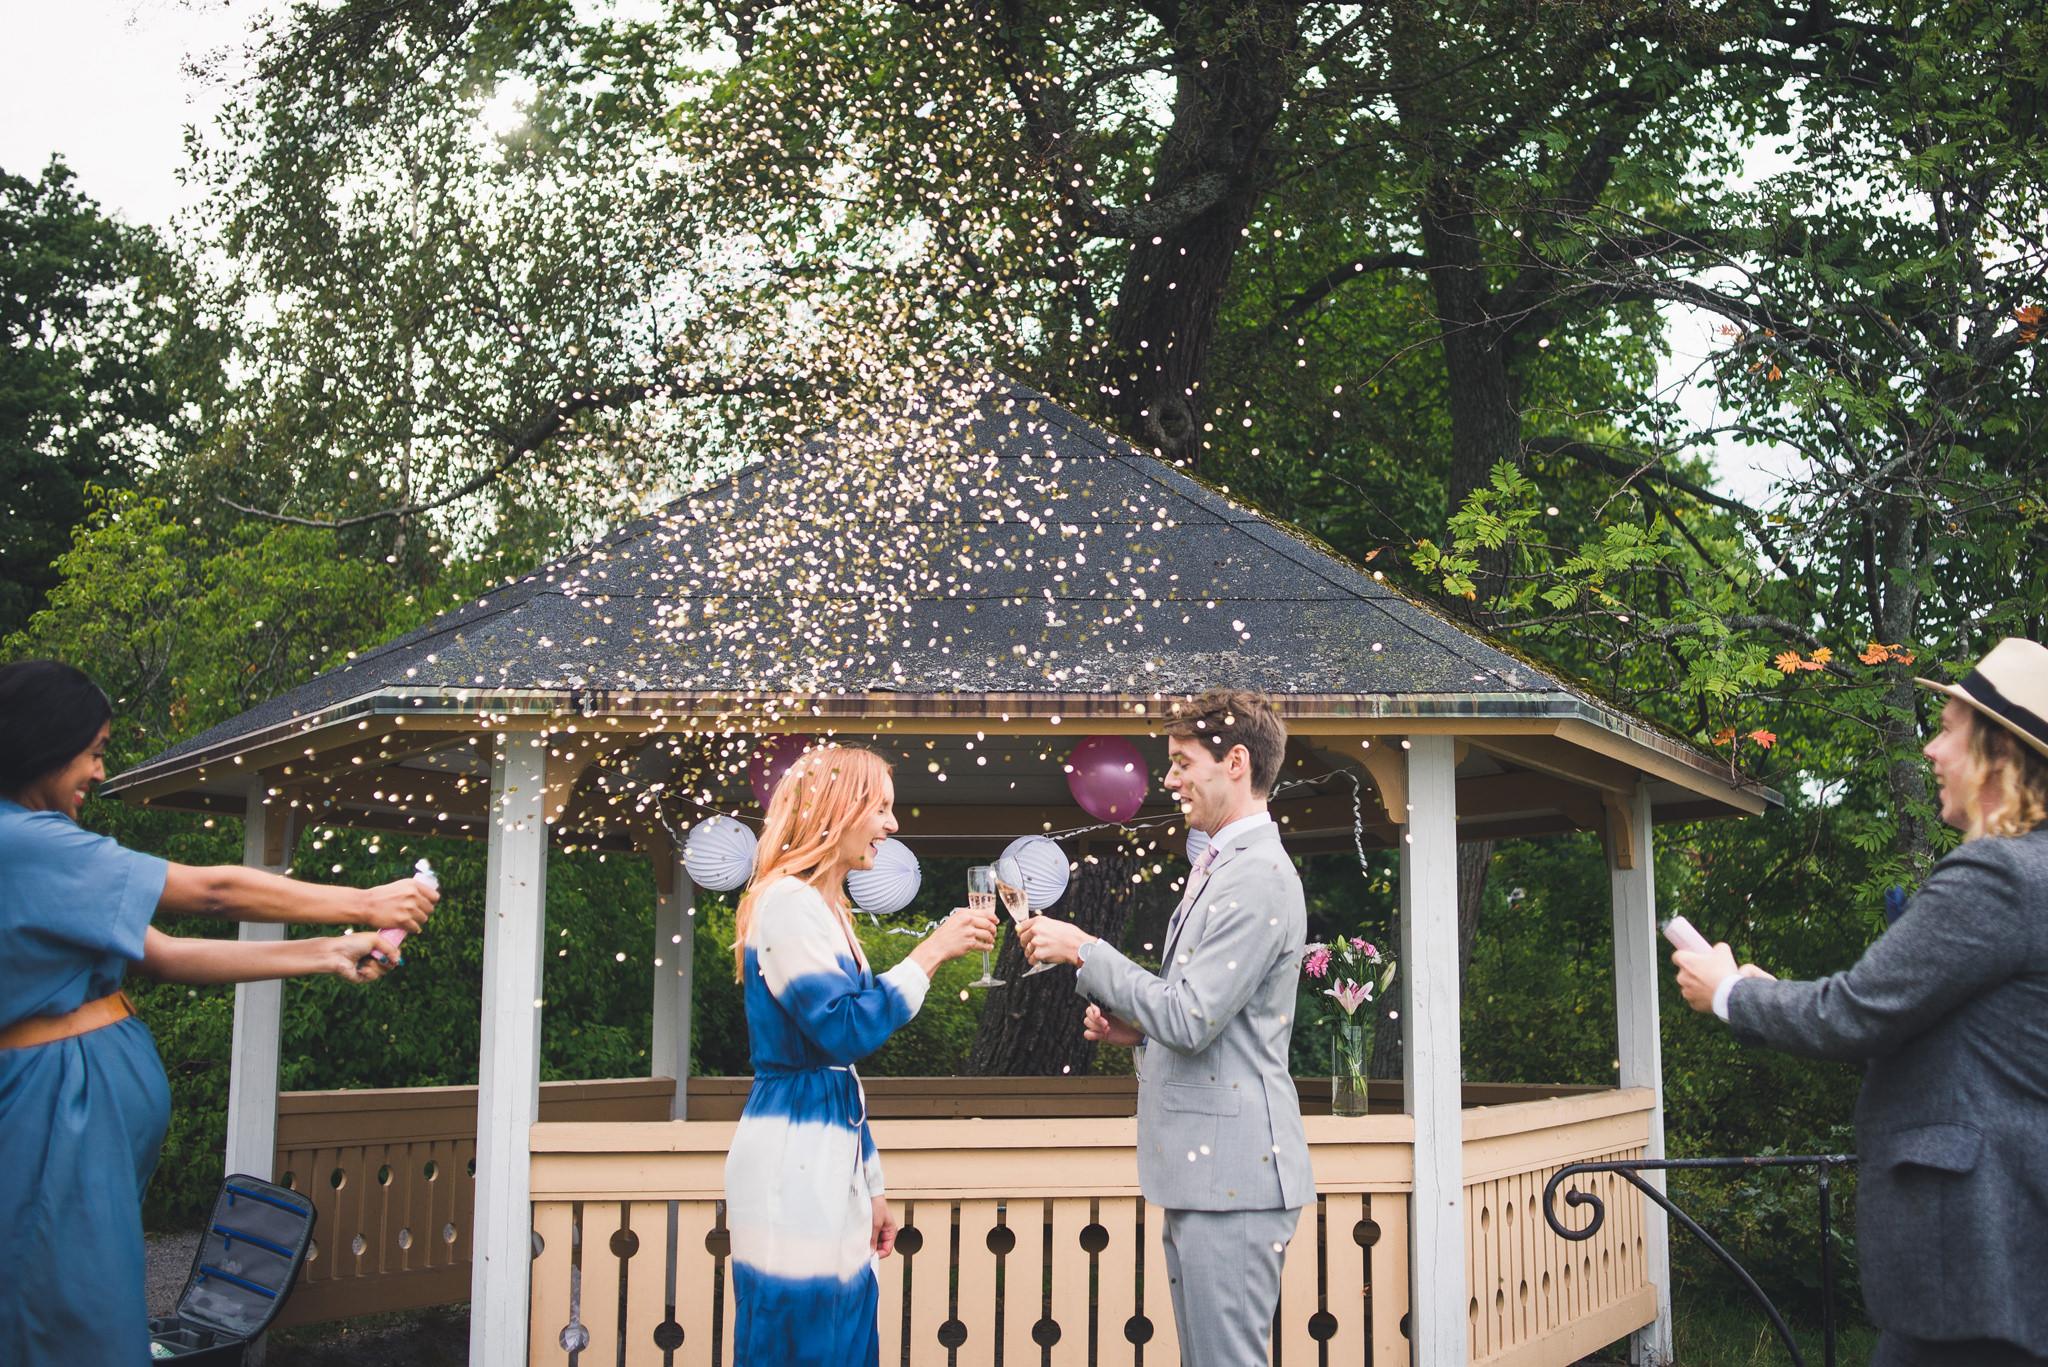 confetti bomb at wedding